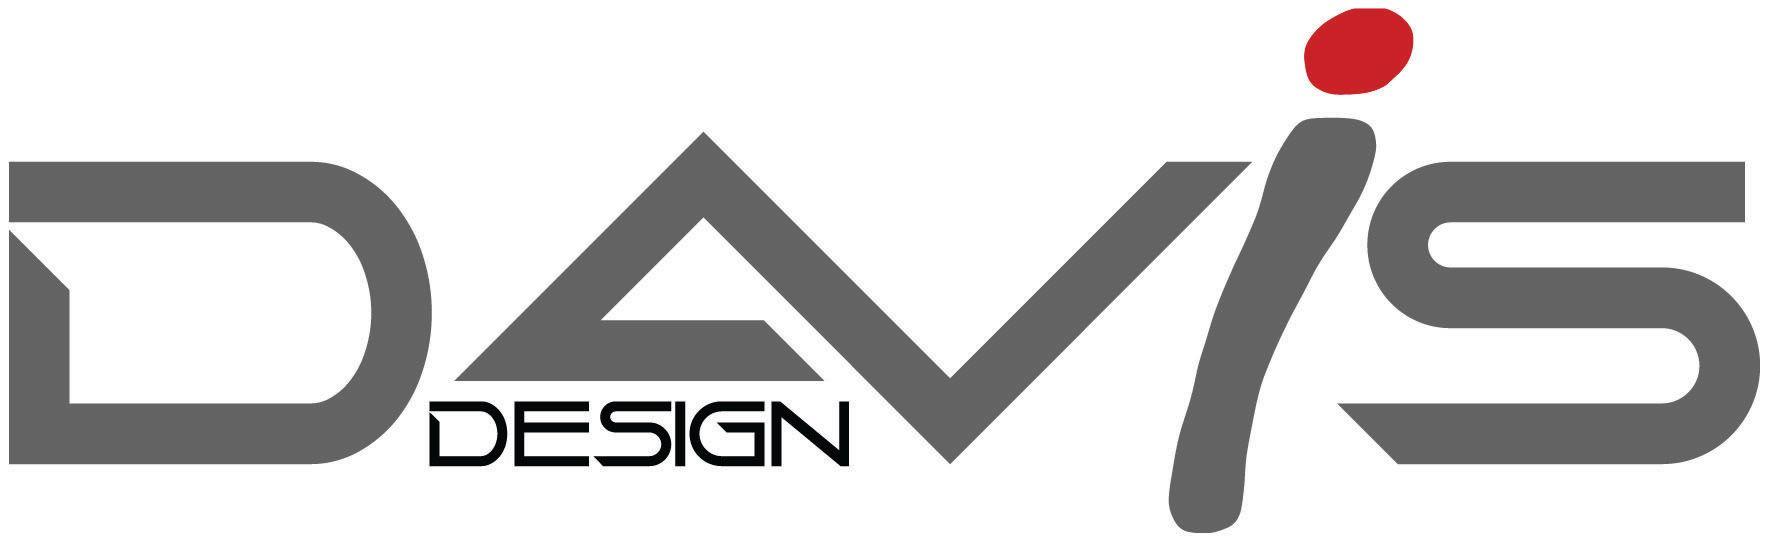 Davis Design Inc.